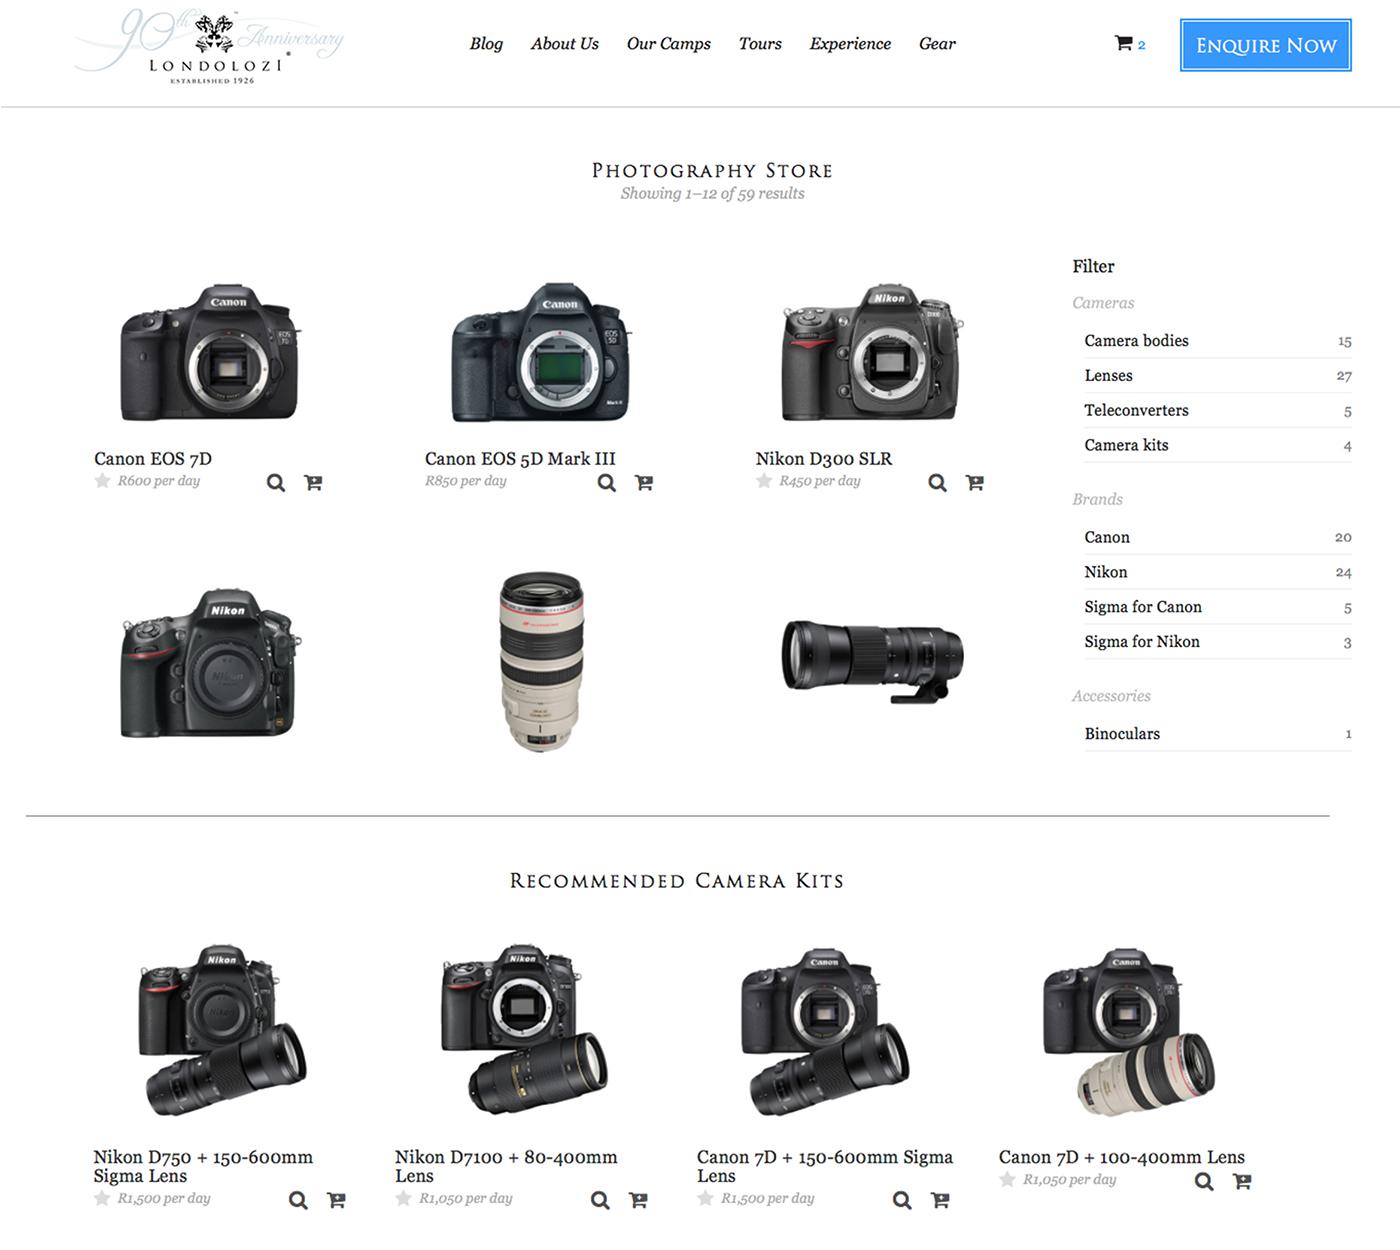 Londolozi Photographic Gear store